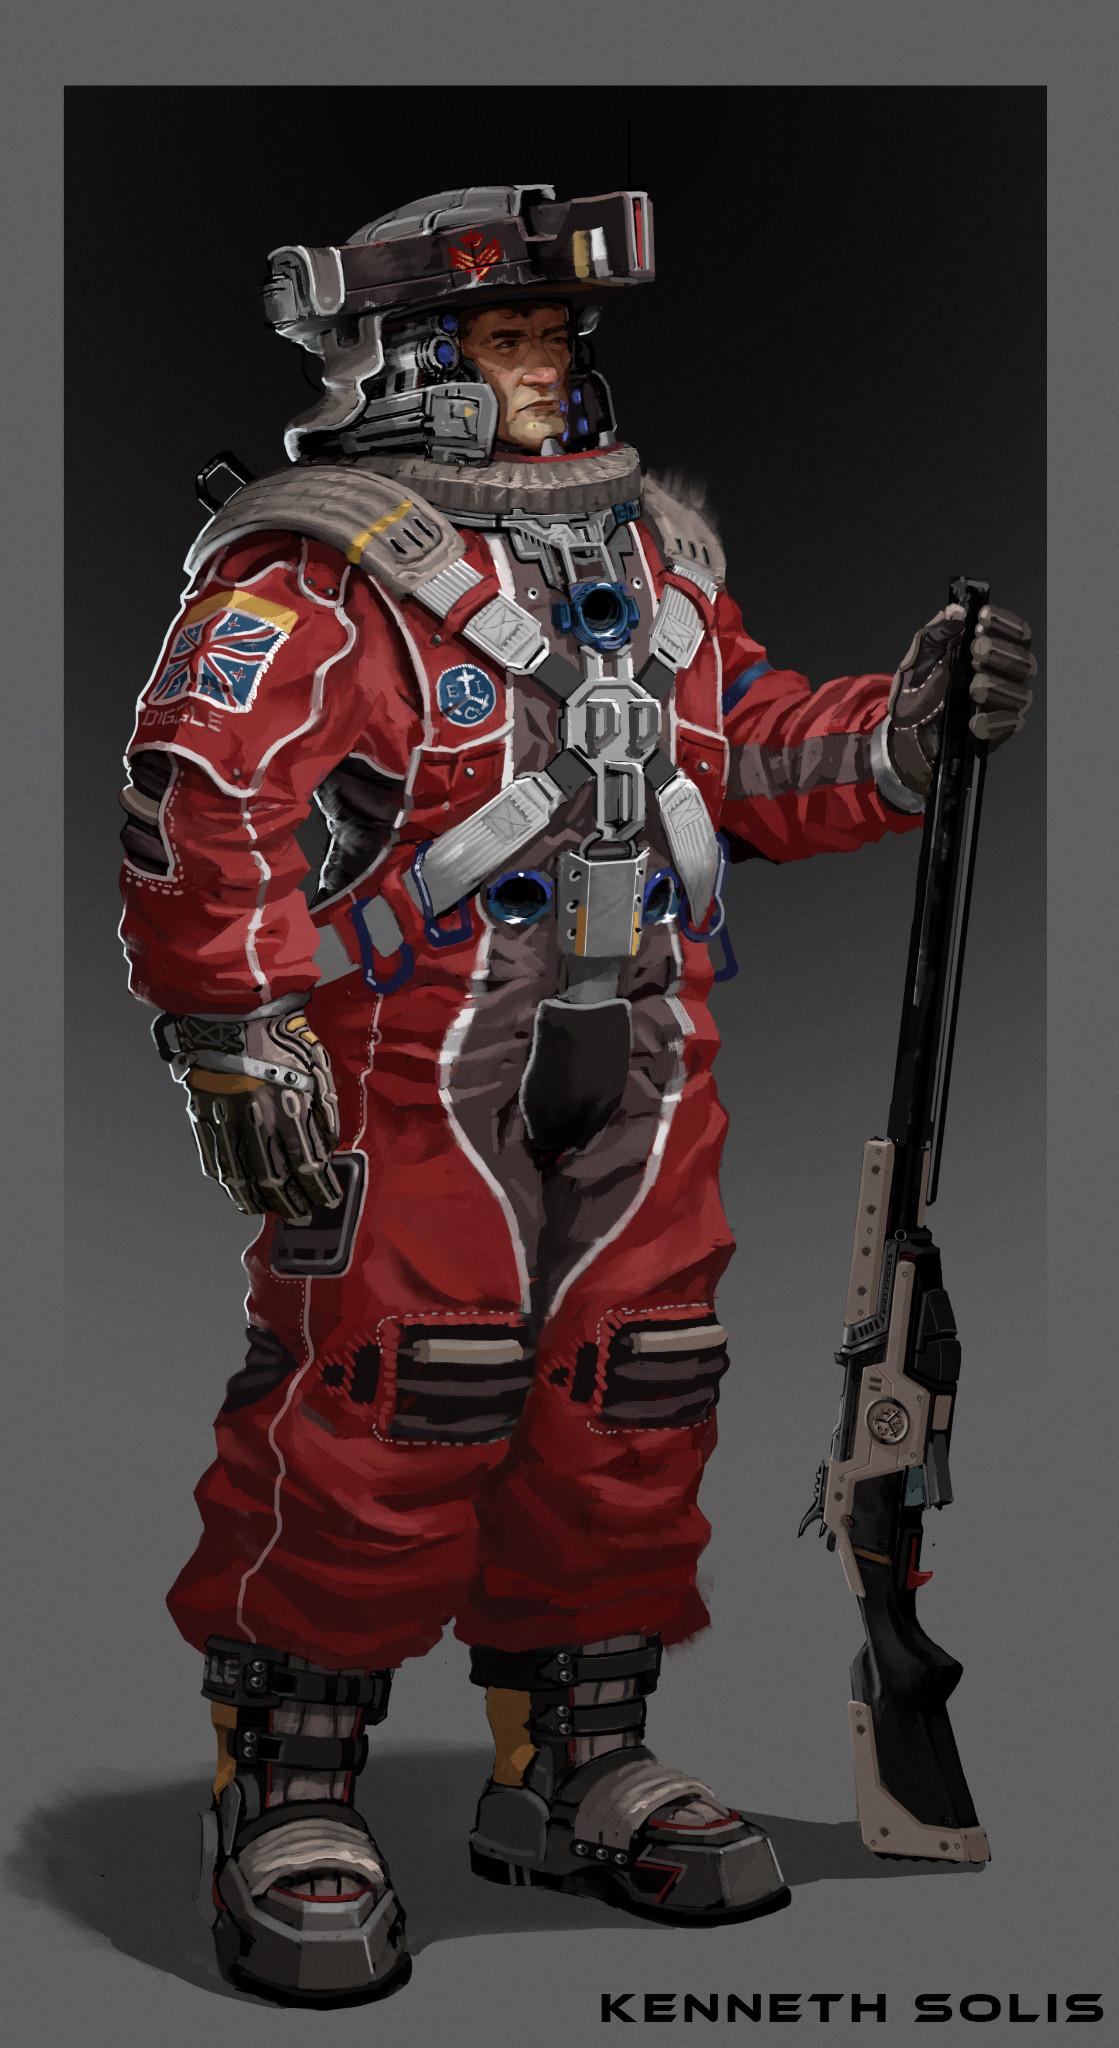 kenneth-solis-ks-pirates2-redcoat.jpg?1488090450